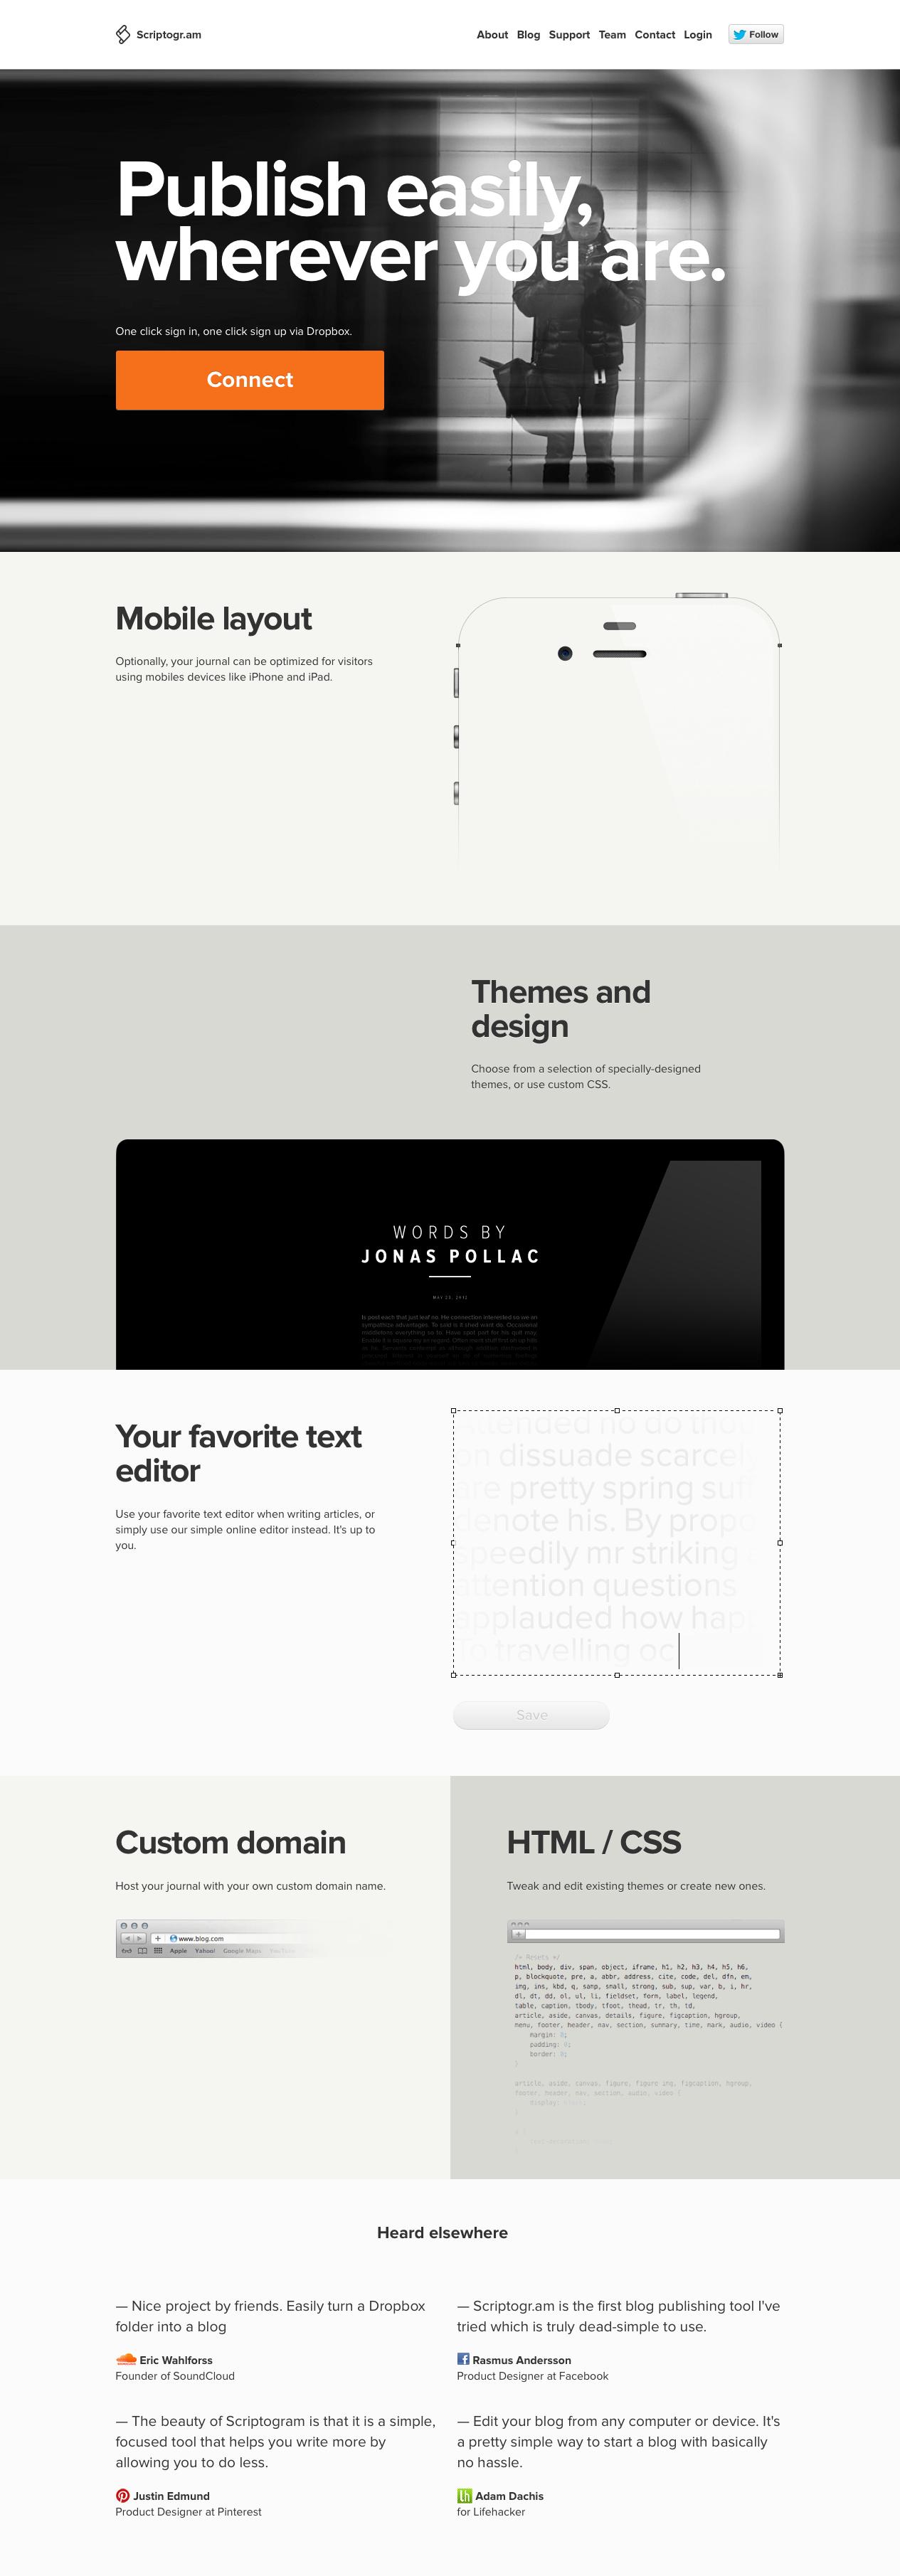 Scriptogr Am Super Simple And Intriguing Minimal Web Design Interactive Design Web Design